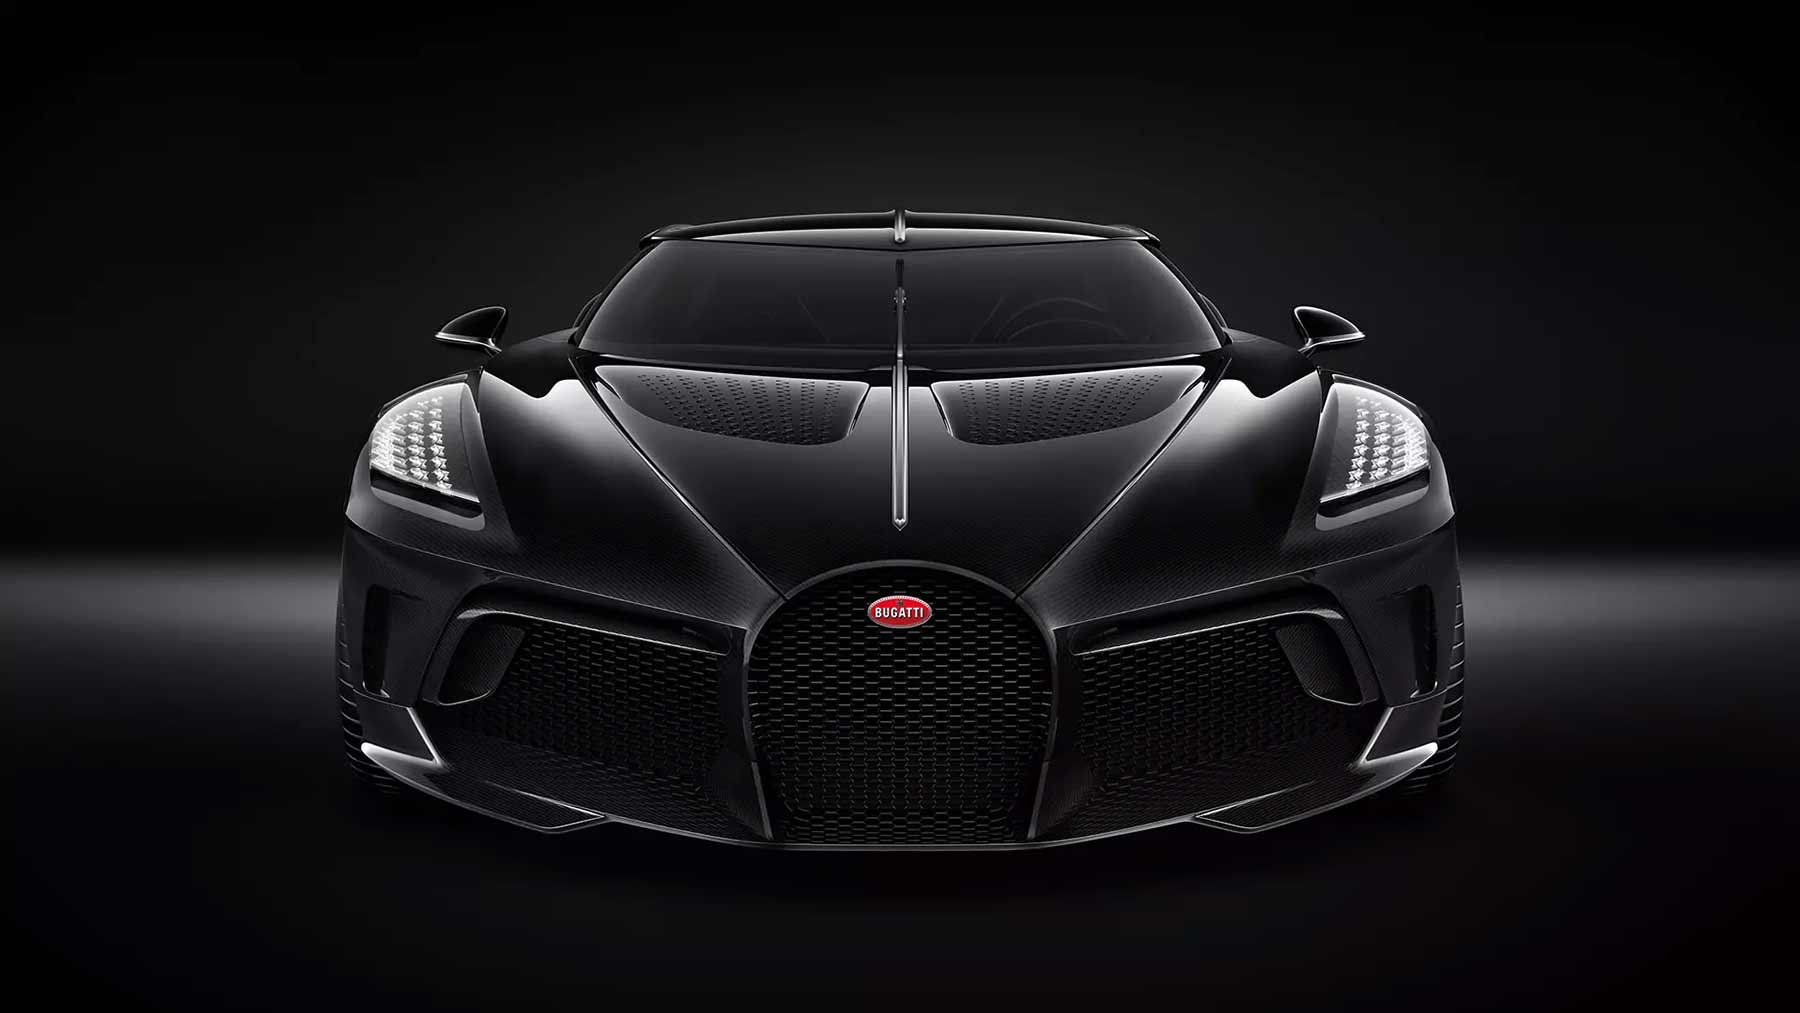 Bugatti La Voiture Noire Bugatti-La-Voiture-Noire_03